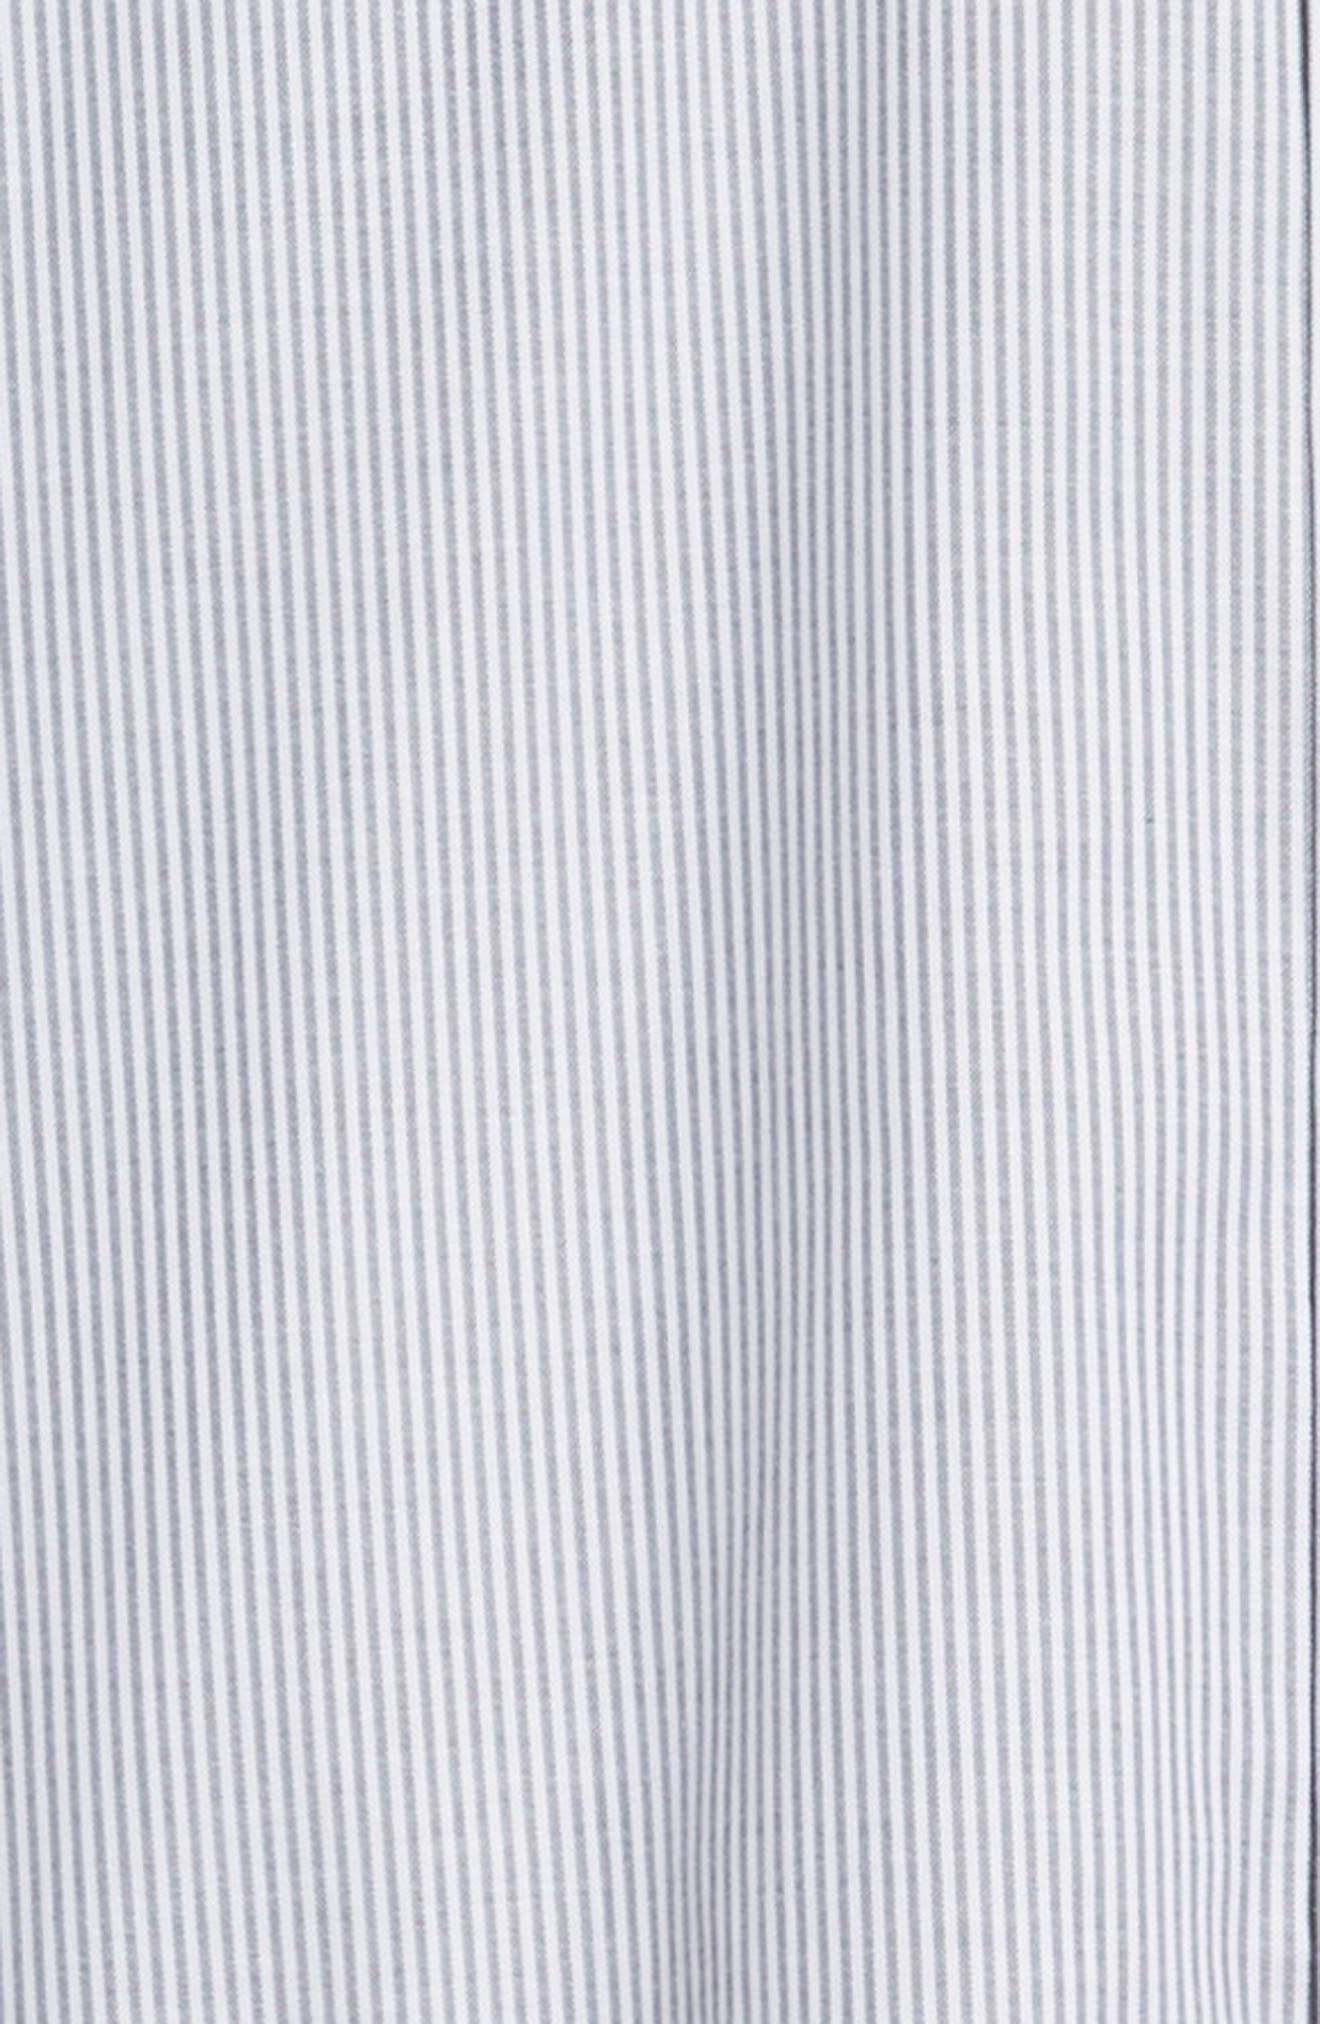 Regular Fit Stripe Stretch Oxford Shirt,                             Alternate thumbnail 6, color,                             CHARCOAL